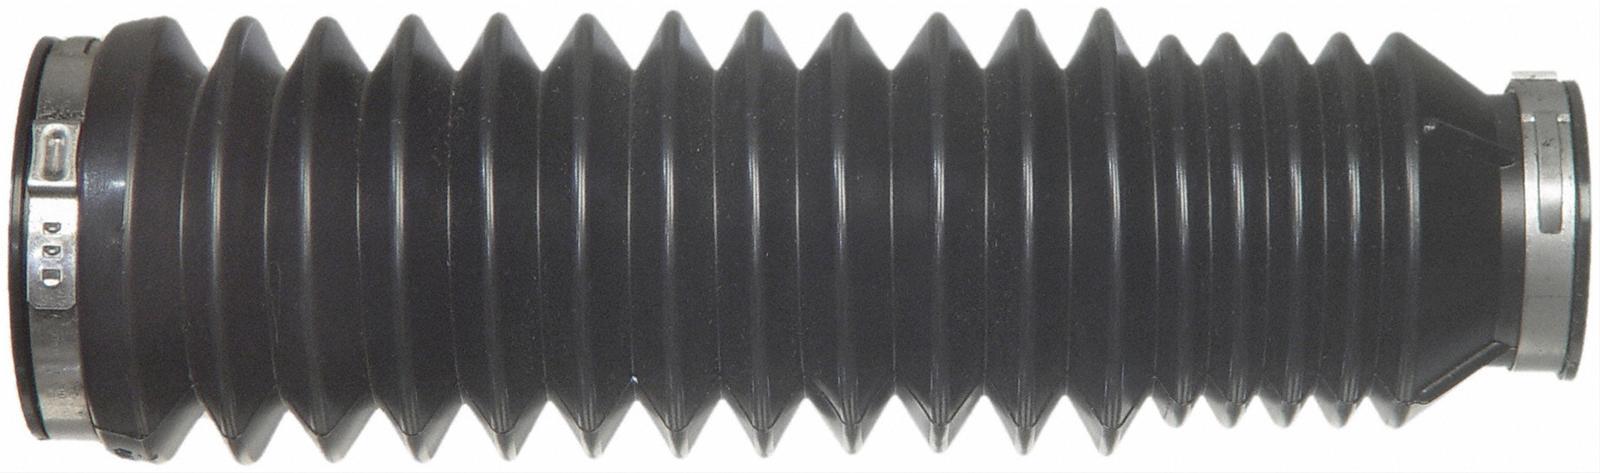 Moog K90079 Rack /& Pinion Bellows